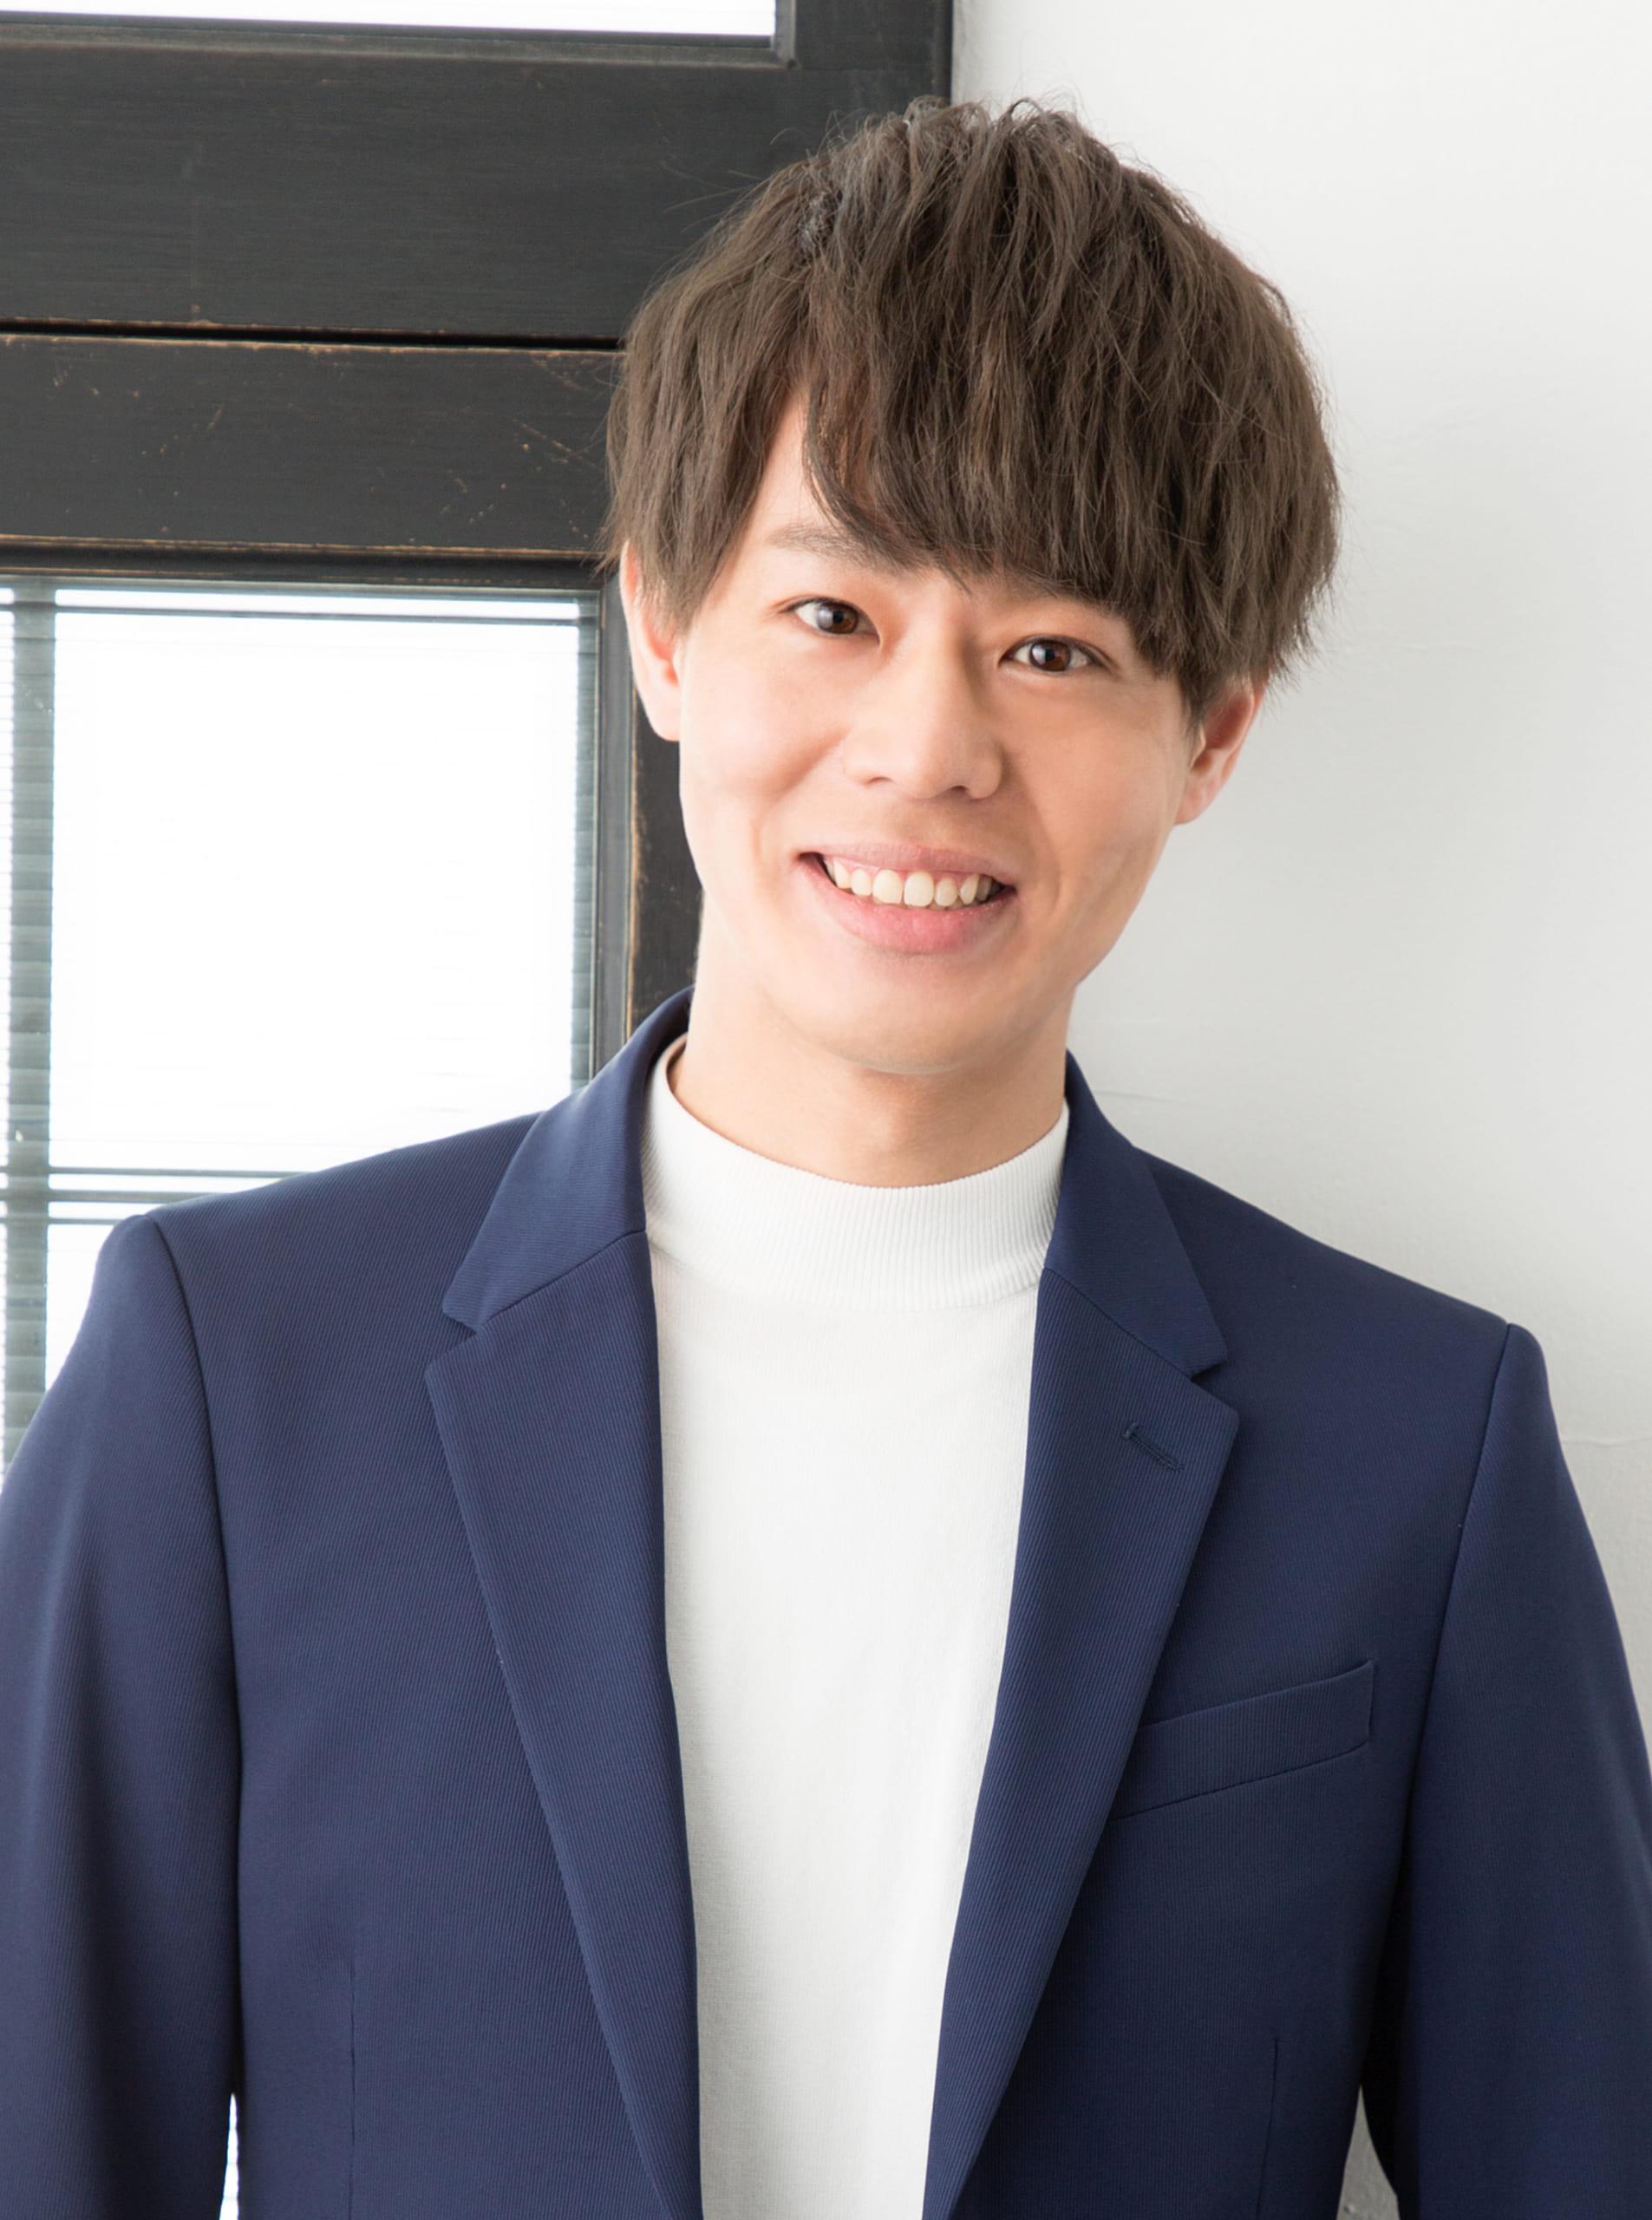 TVアニメ「約束のネバーランド」第2期ソンジュ役:神尾晋一郎さん